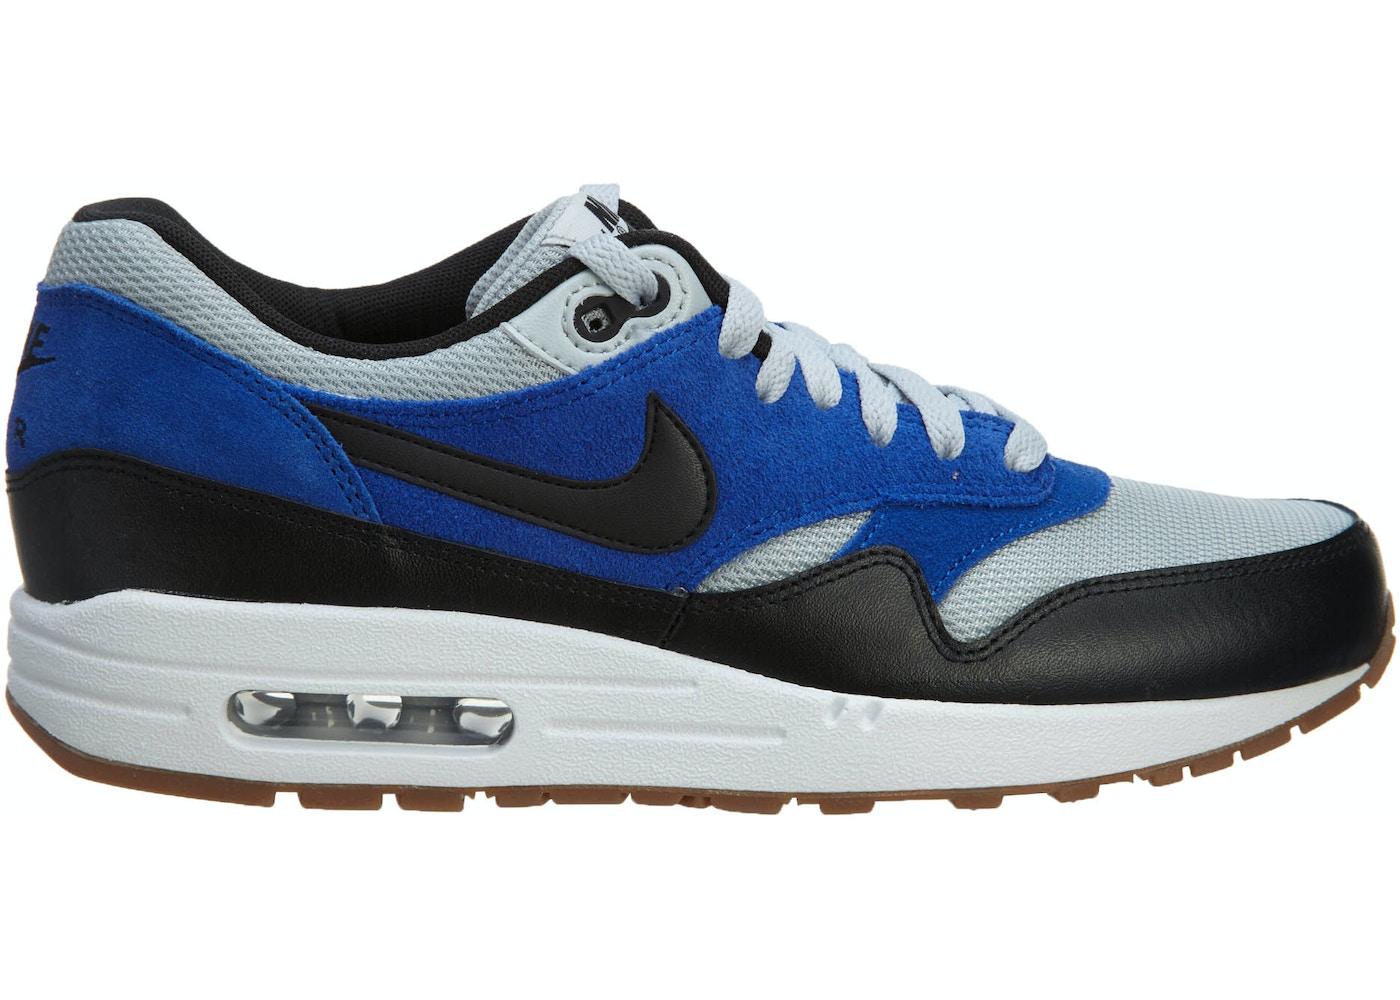 cigarro barrer suizo  Nike Air Max1 Essential Grey Mist/Black-Lyon Blue - 537383-022